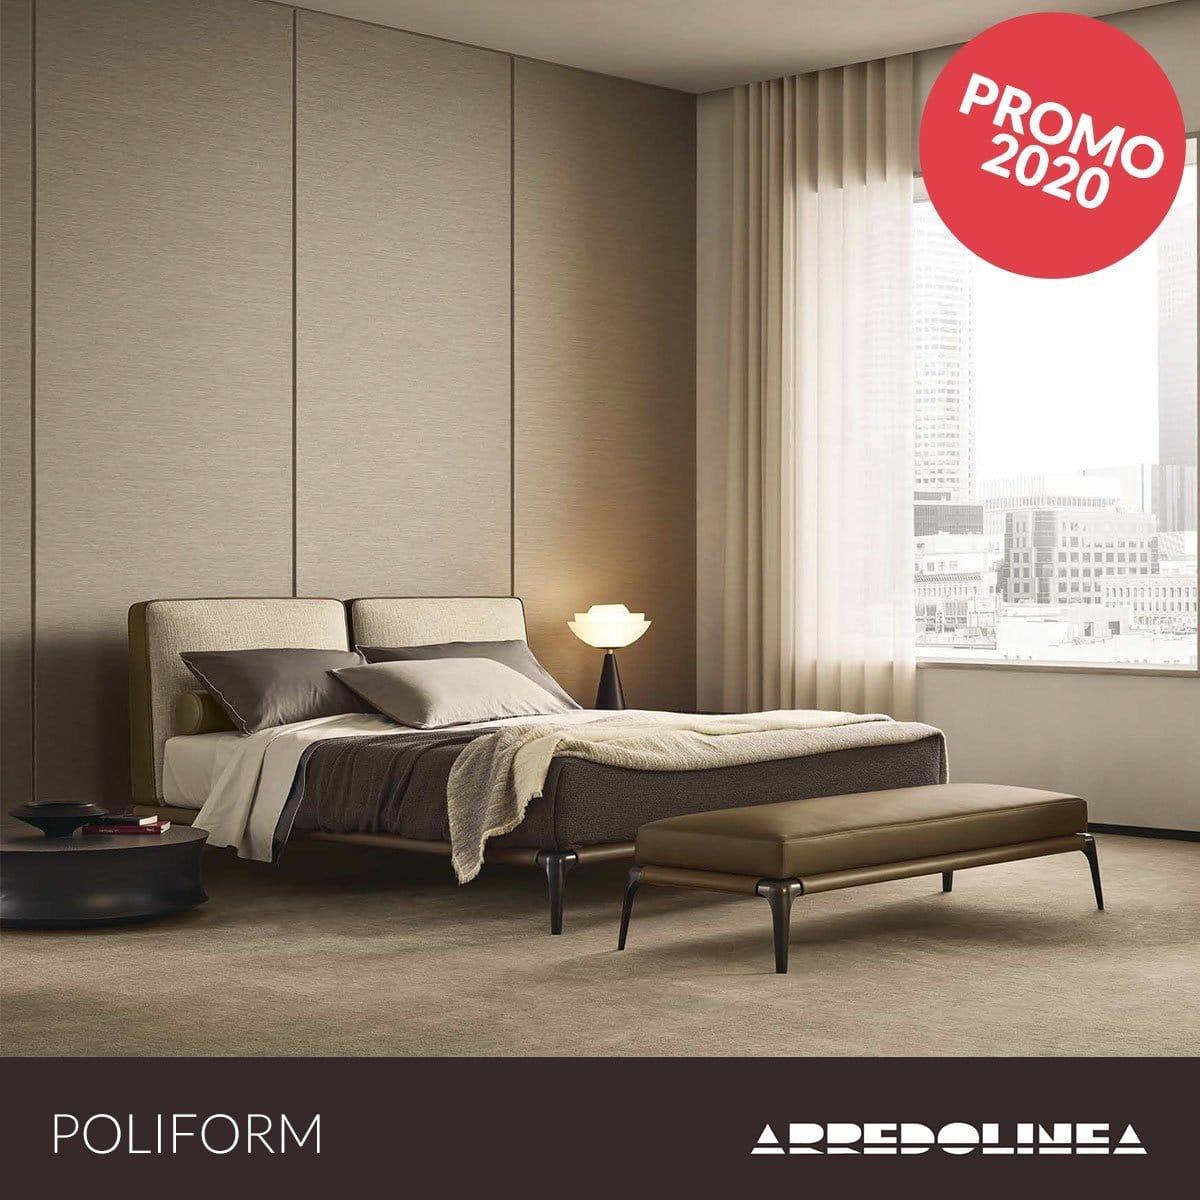 Promo 2020 - Poliform